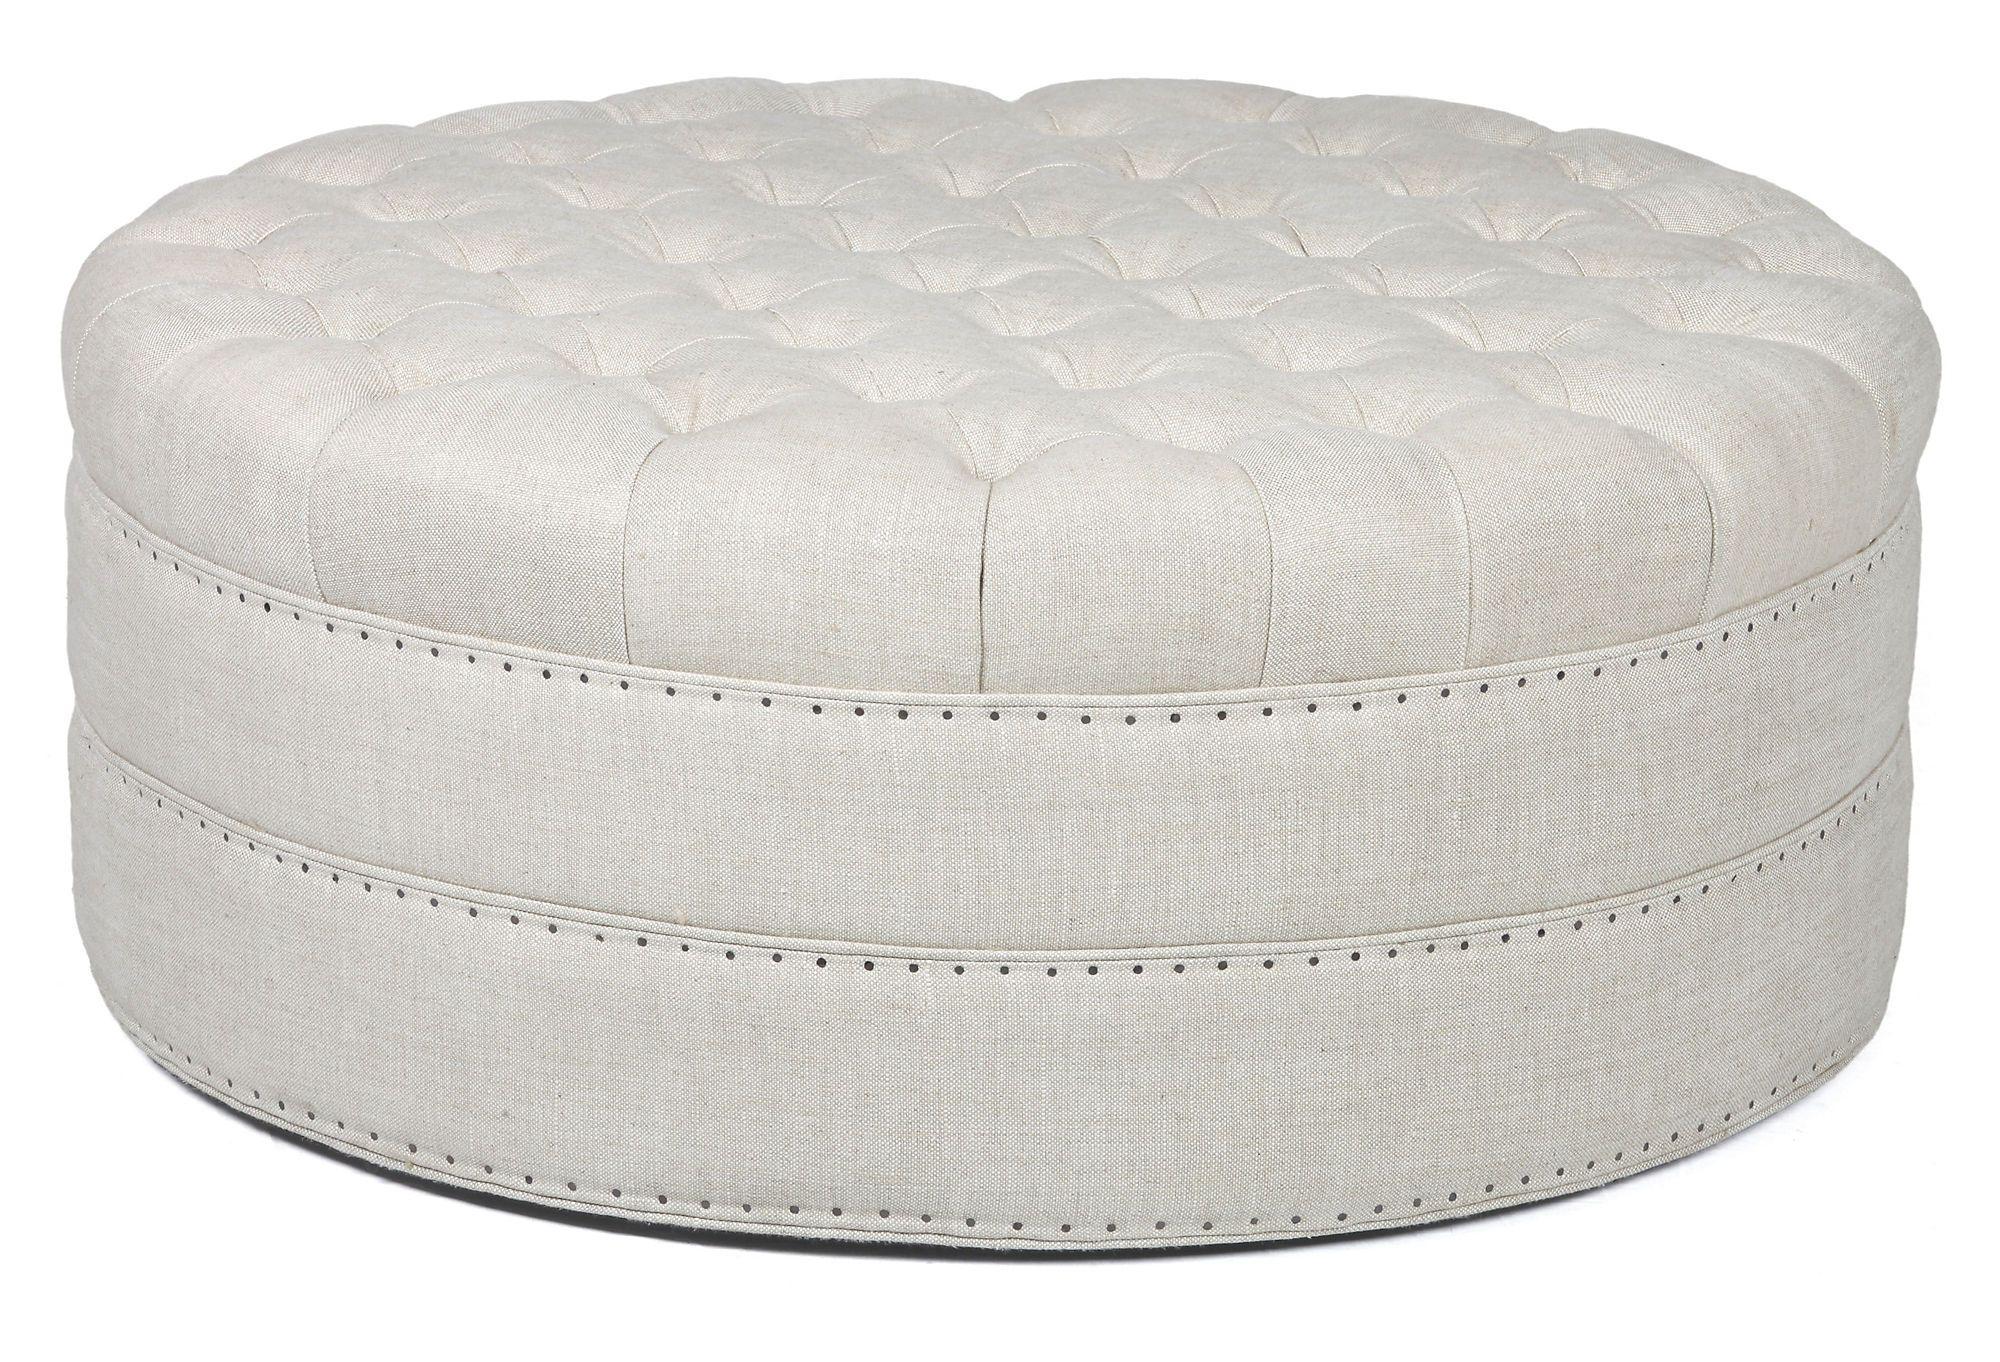 round tufted leather ottoman ideas on